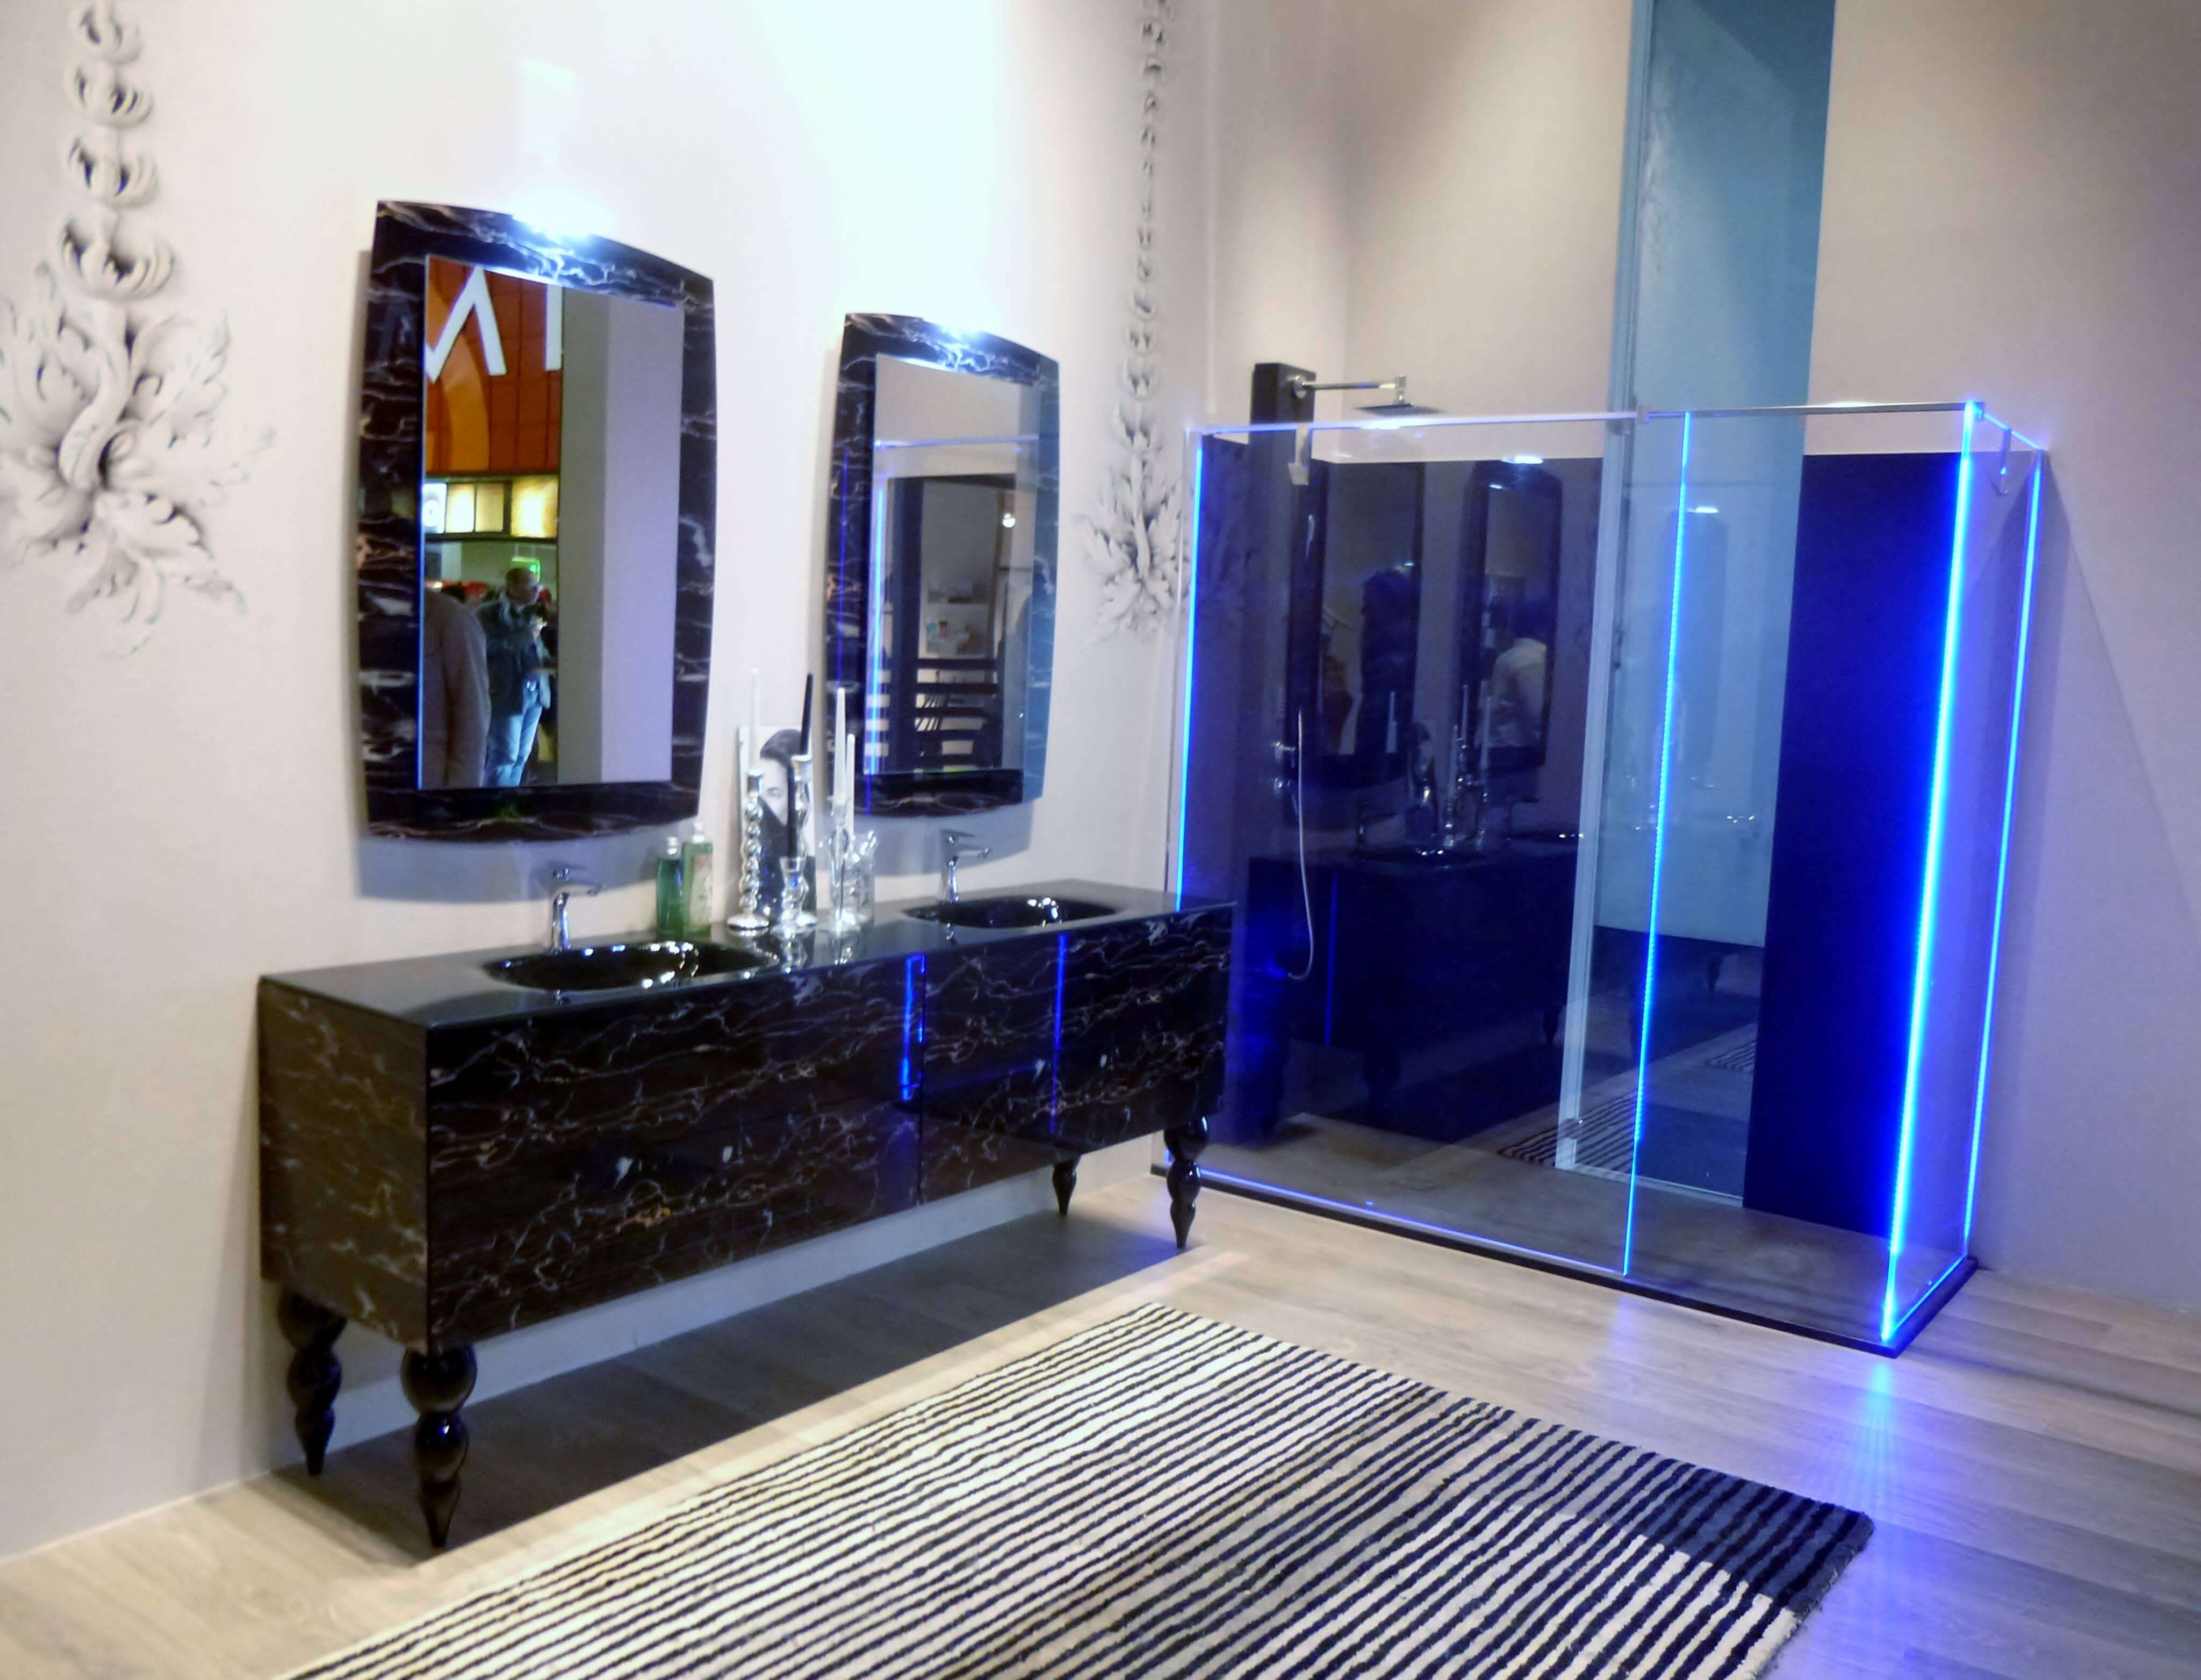 Salone del bagno die gr te badezimmermesse der welt - Fiera del bagno bologna ...